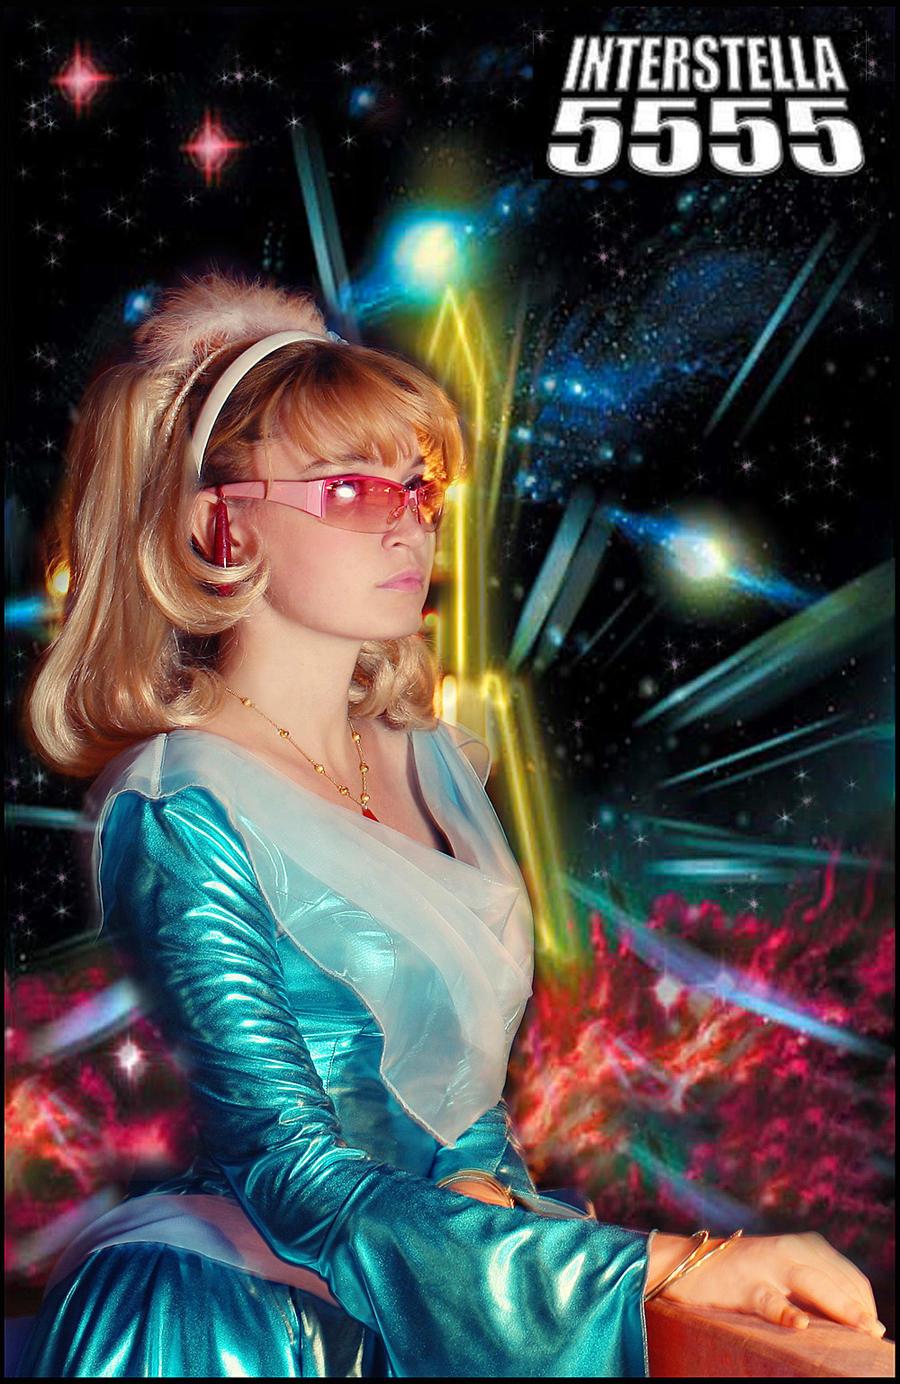 Interstellar 5555